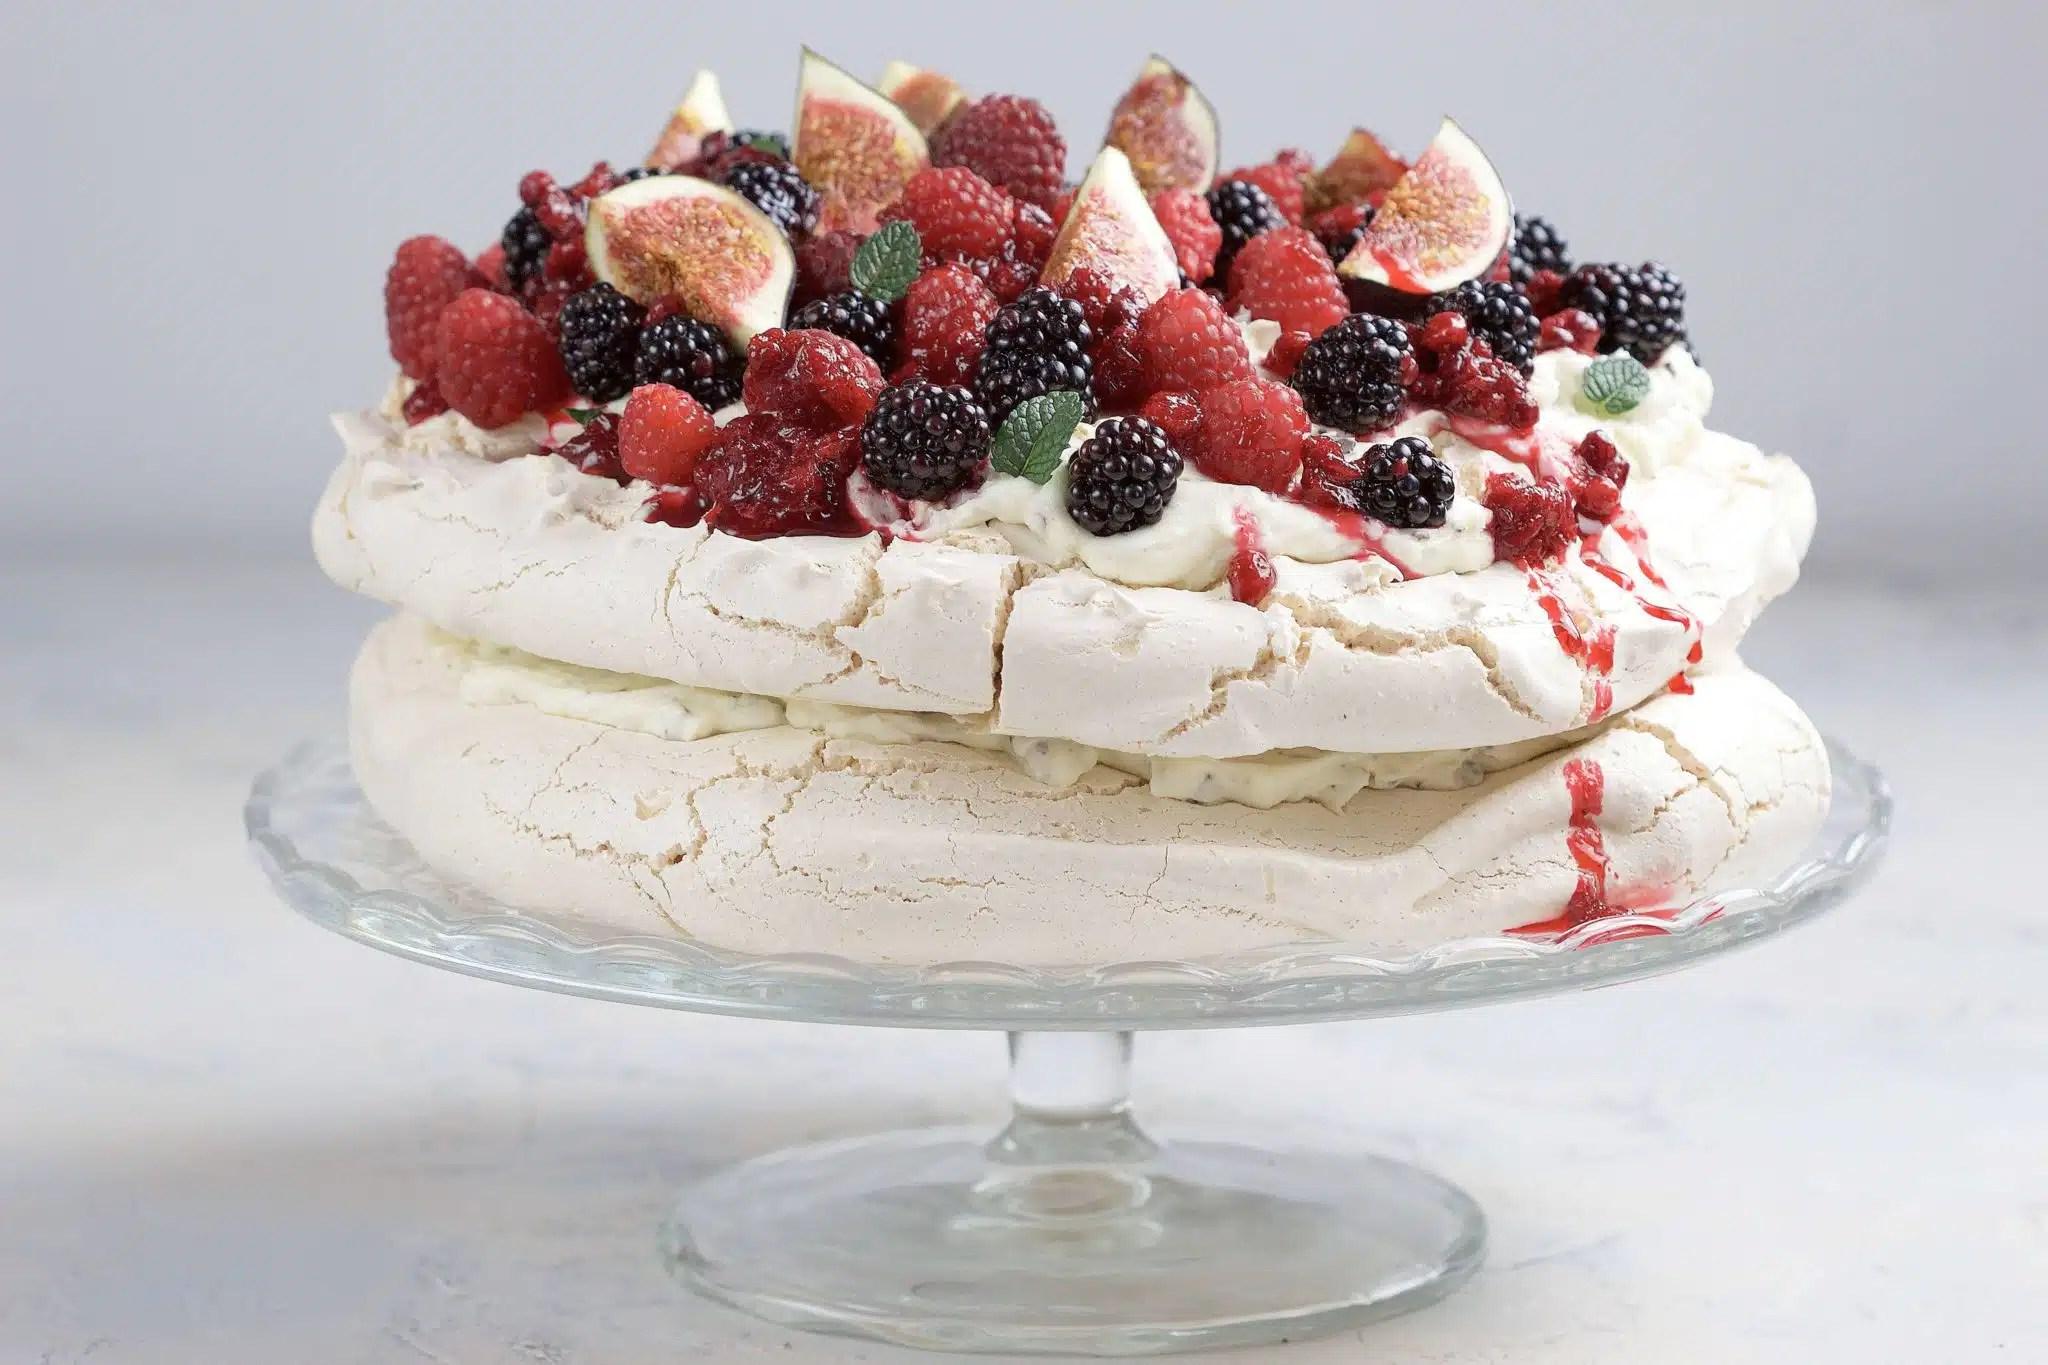 Pavlova meringue with fresh berries and stracciatella cream.